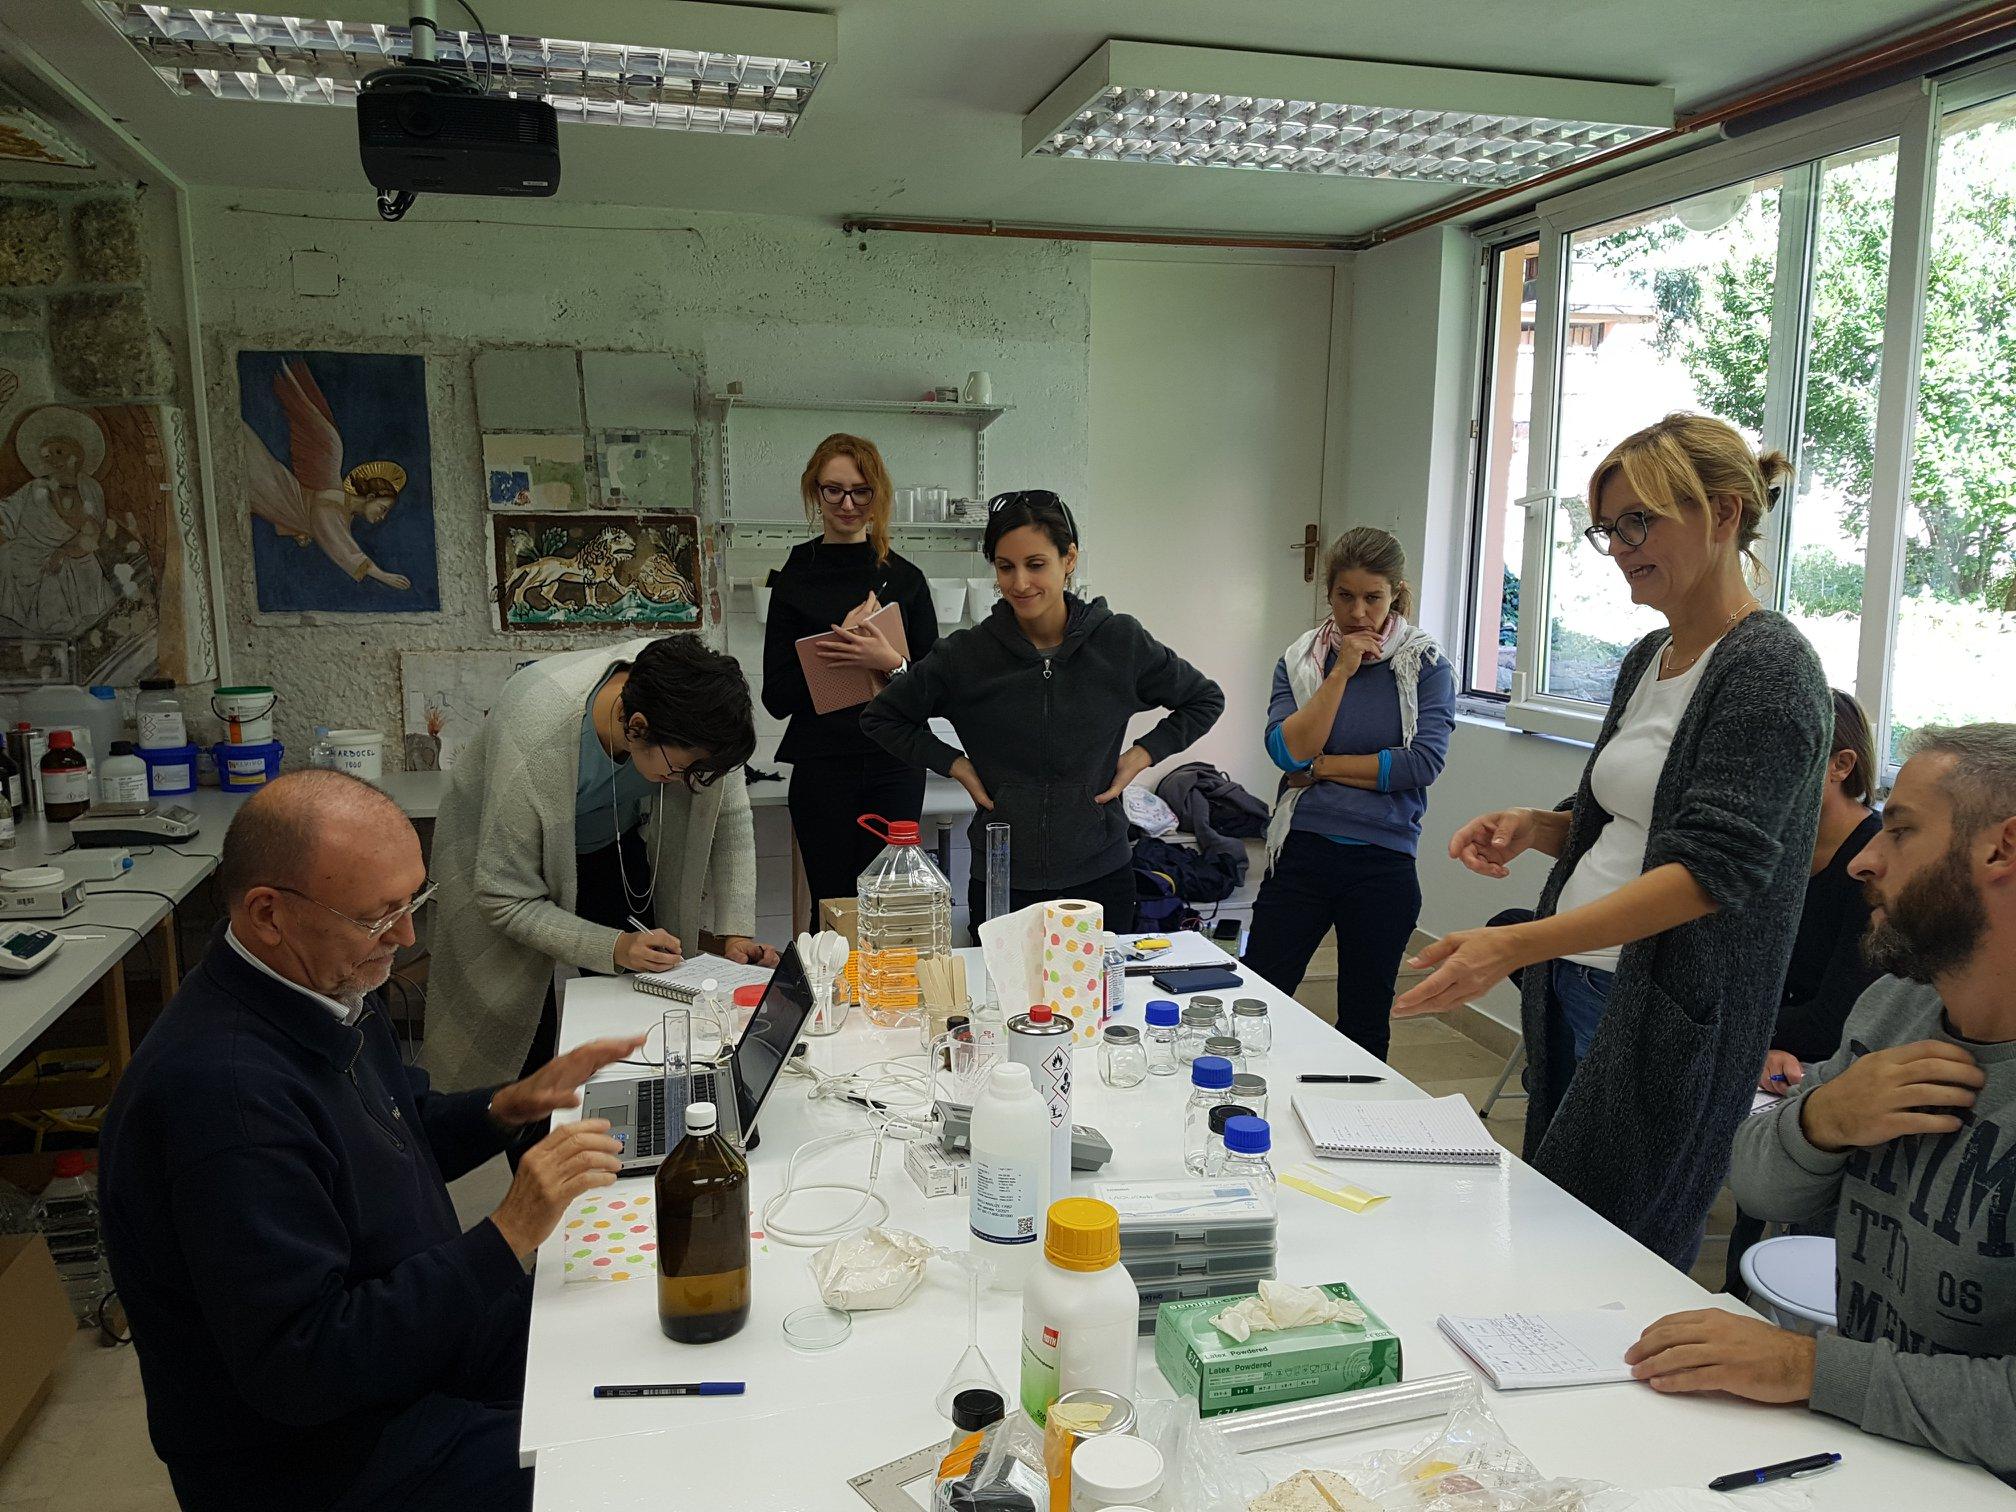 Prof. M. Coladonato, A. Marra, and participants of the workshop at the Department studios. Image courtesy of Ajda Mladenovič.